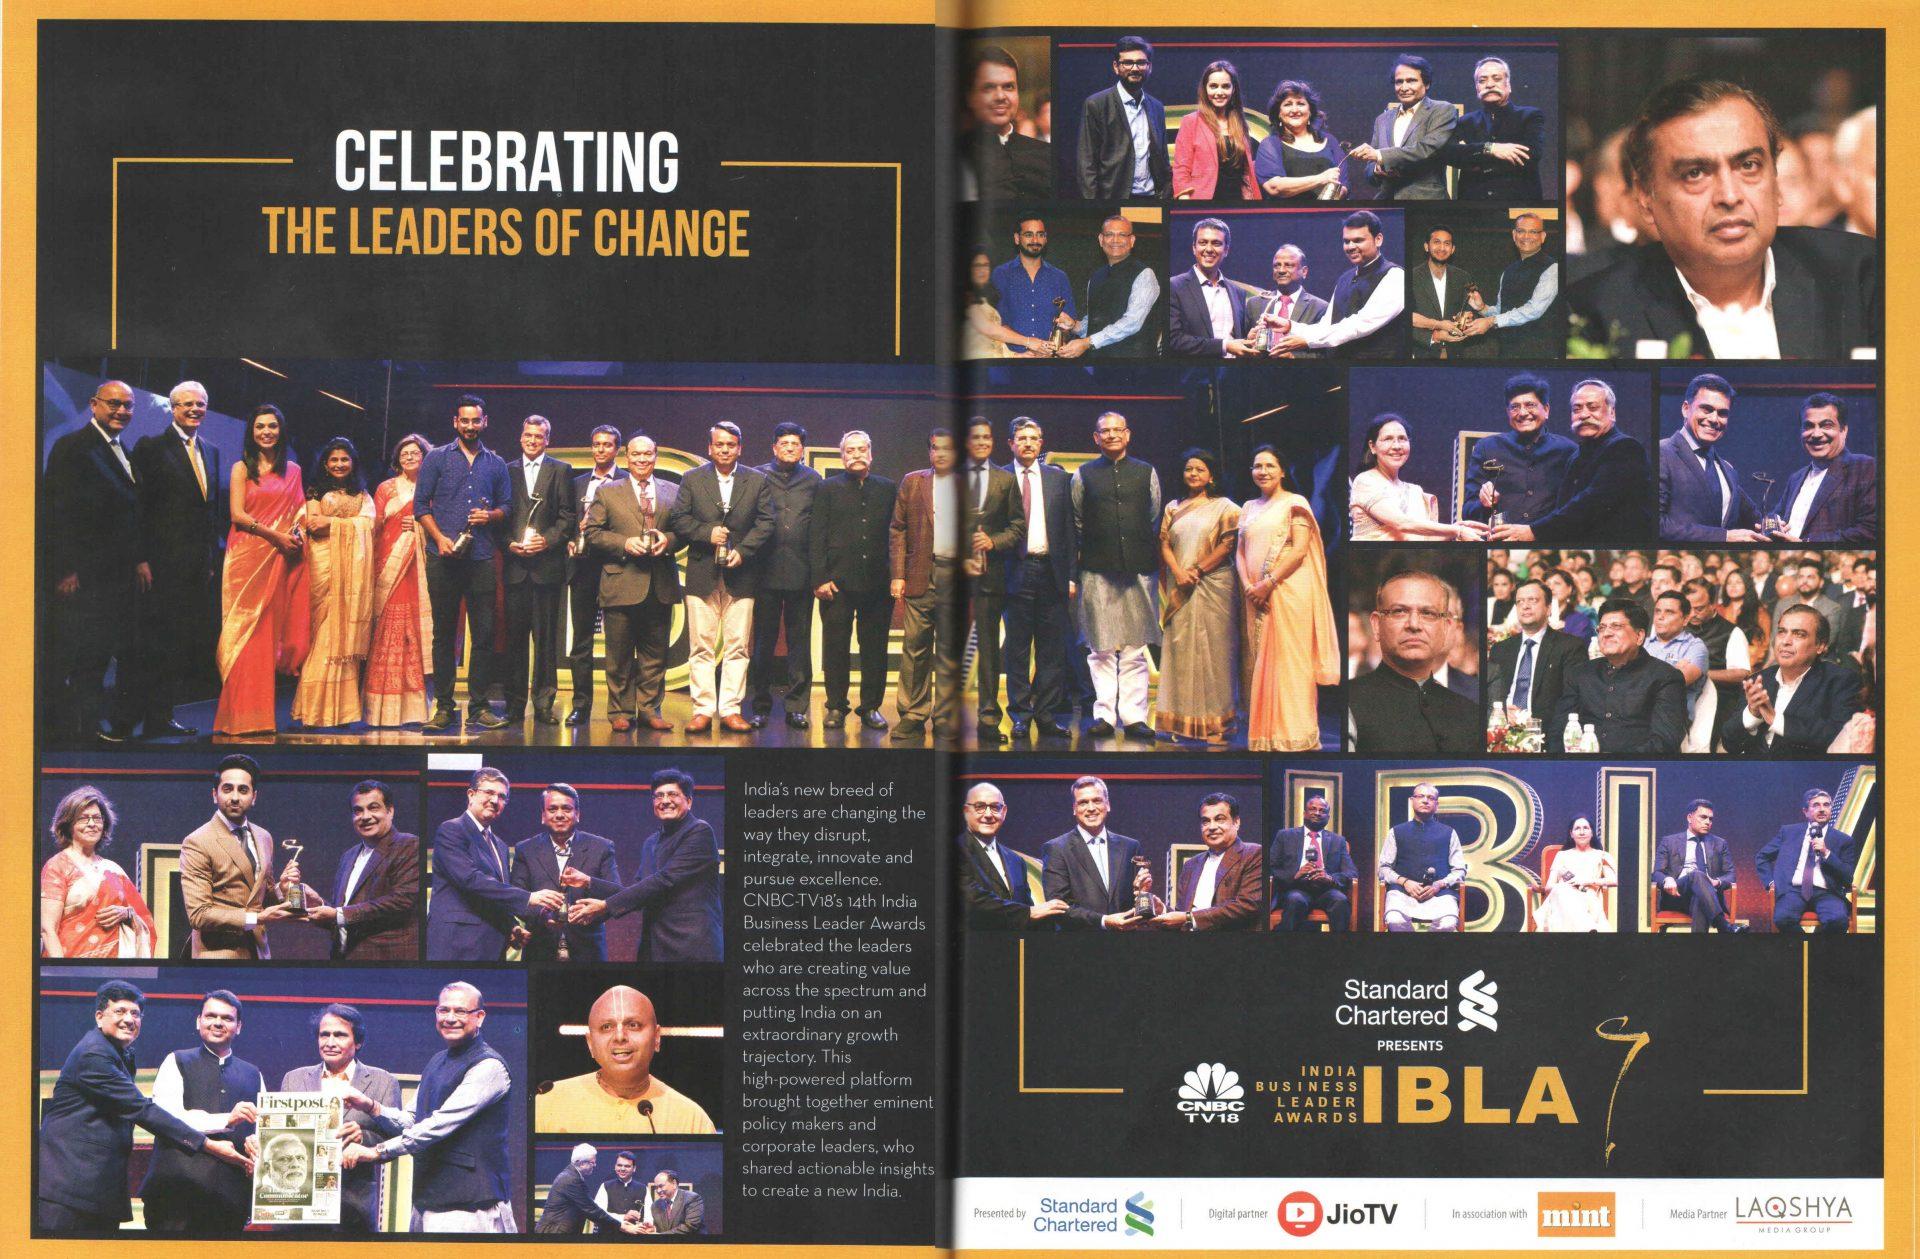 Spiritual Guru Gaur Gopal Das addressing the audience at IBLA Awards 2019